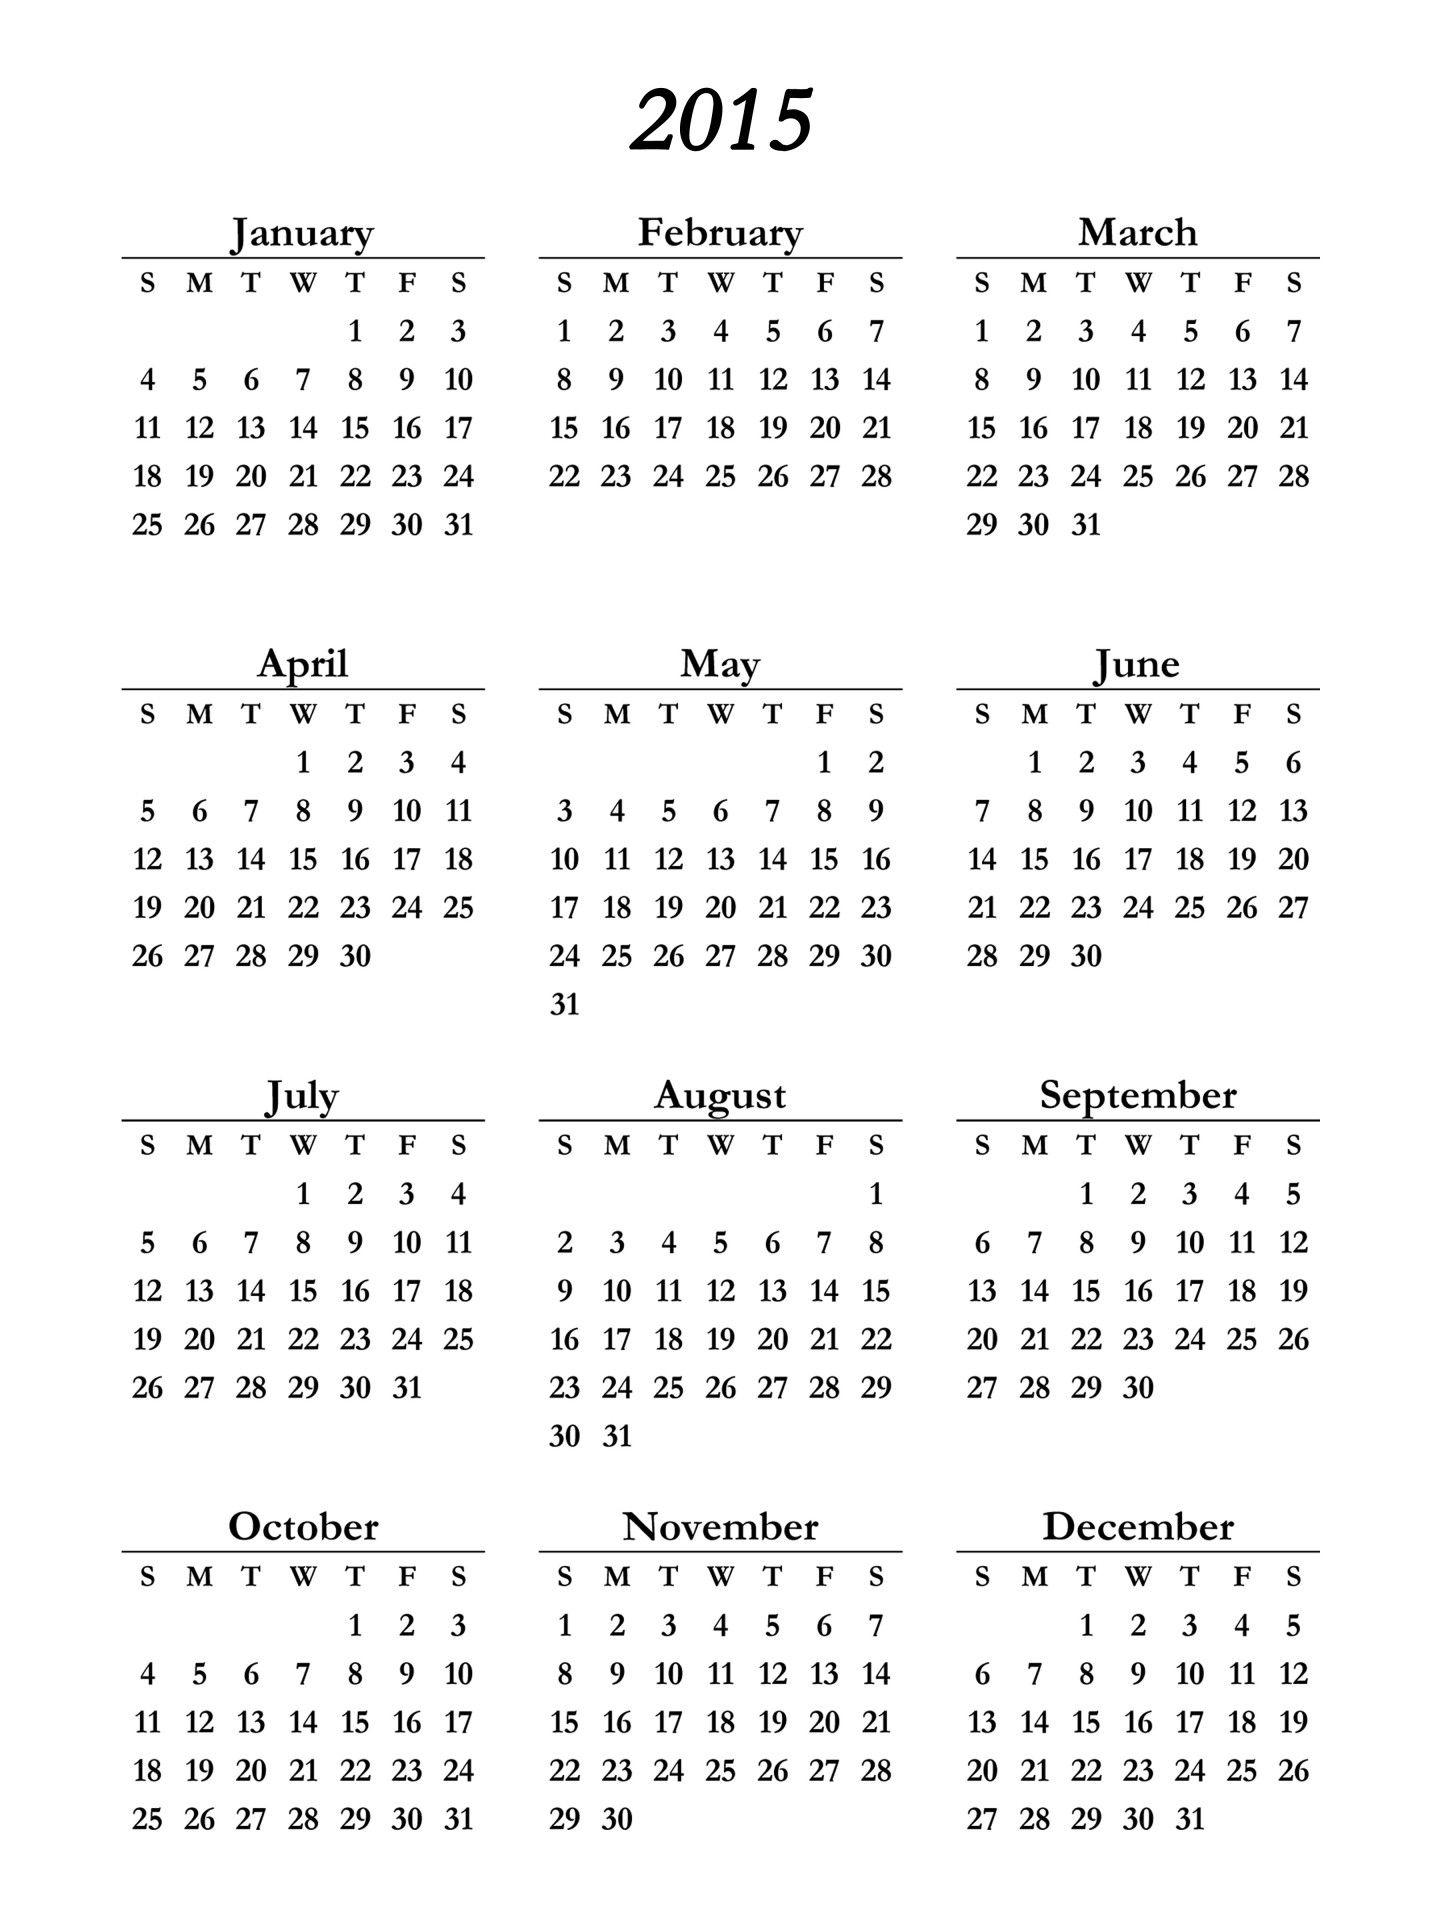 2015 Calendar Printable - Free Large Images | 2 | Pinterest | 2015 - Free Printable Diary 2015